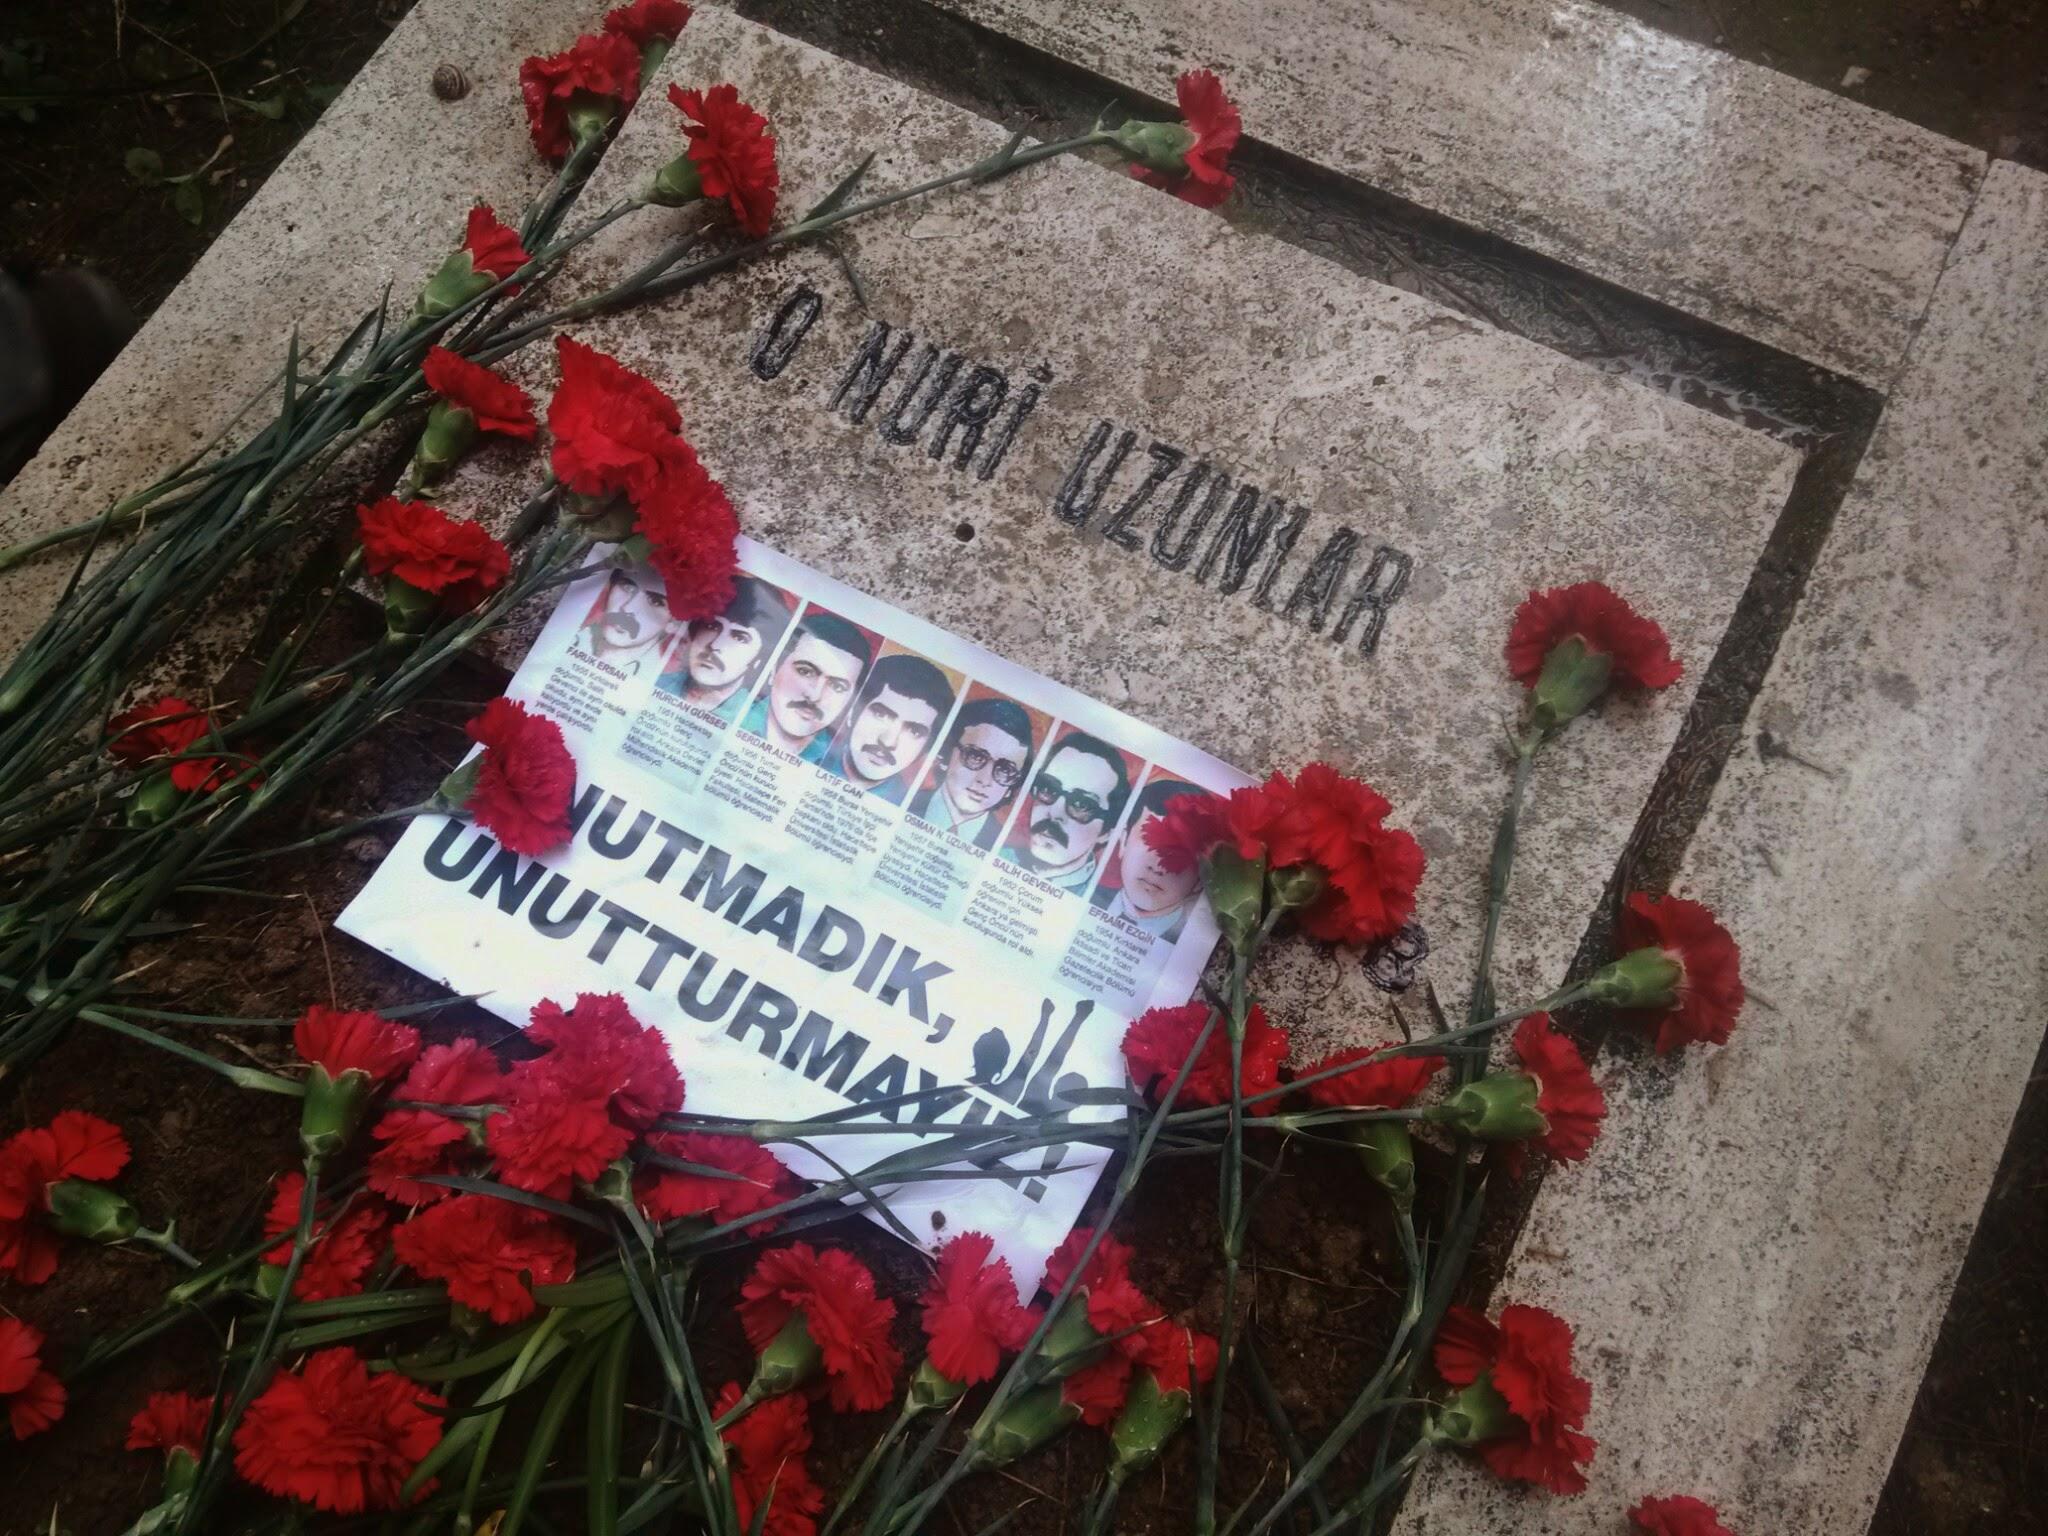 Bir faşist katil daha aklandı…